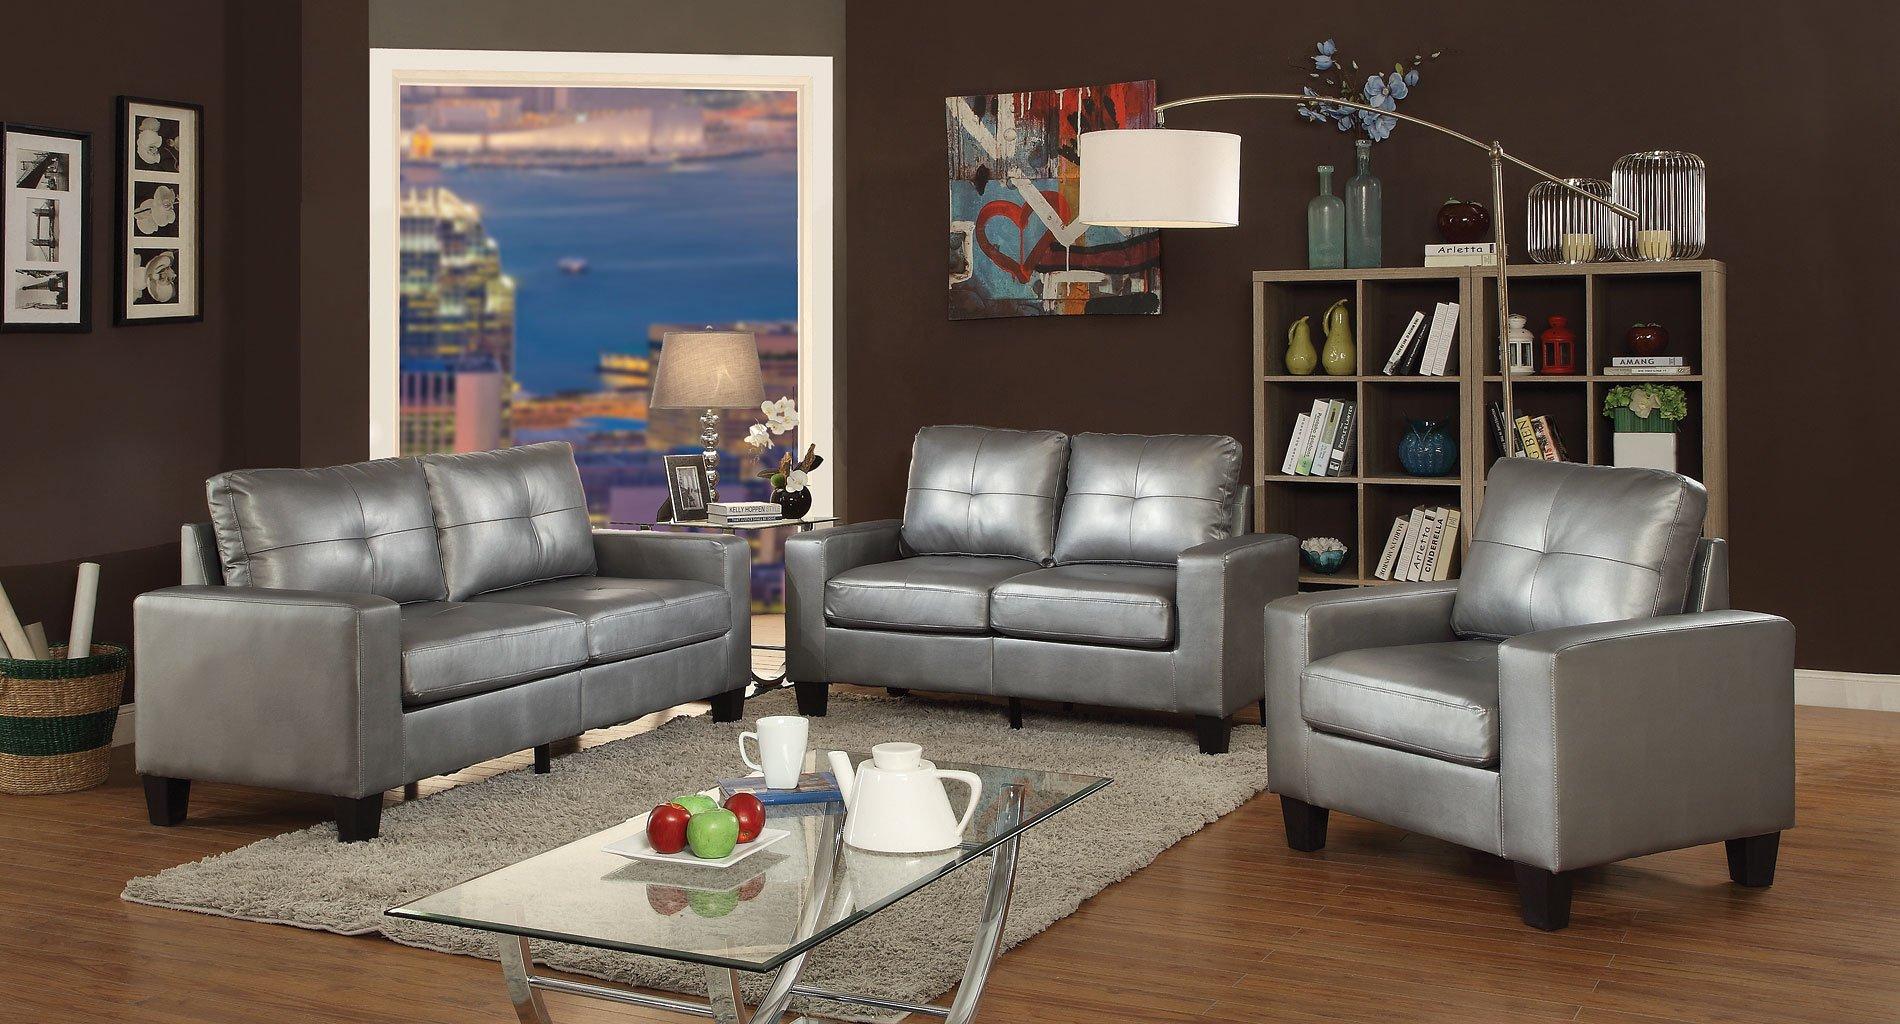 Newbury living room set antiqued silver living room sets living room furniture living room - Silver living room furniture ...